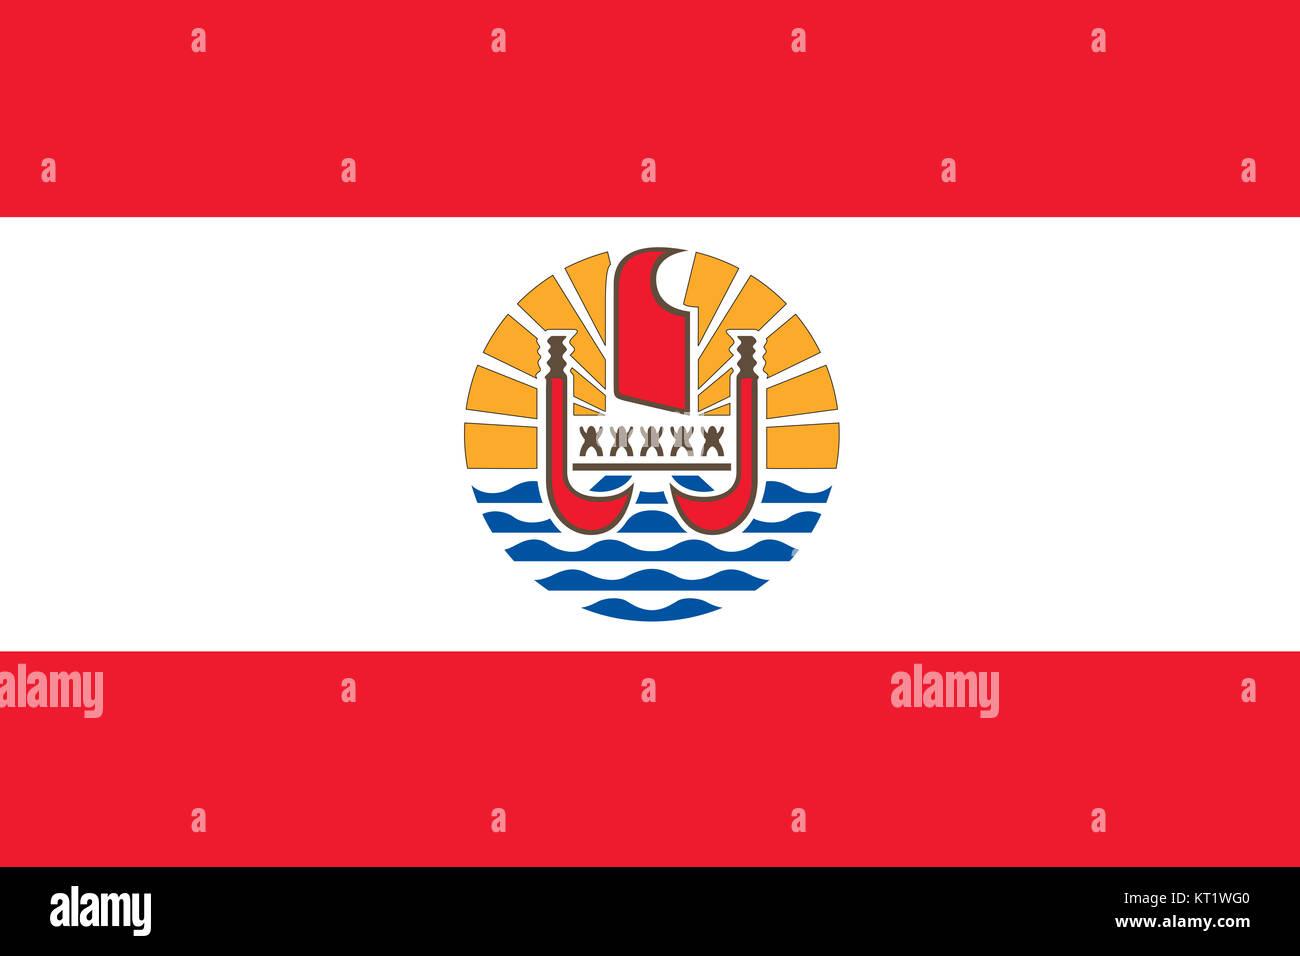 National flag of French Polynesia - Stock Image